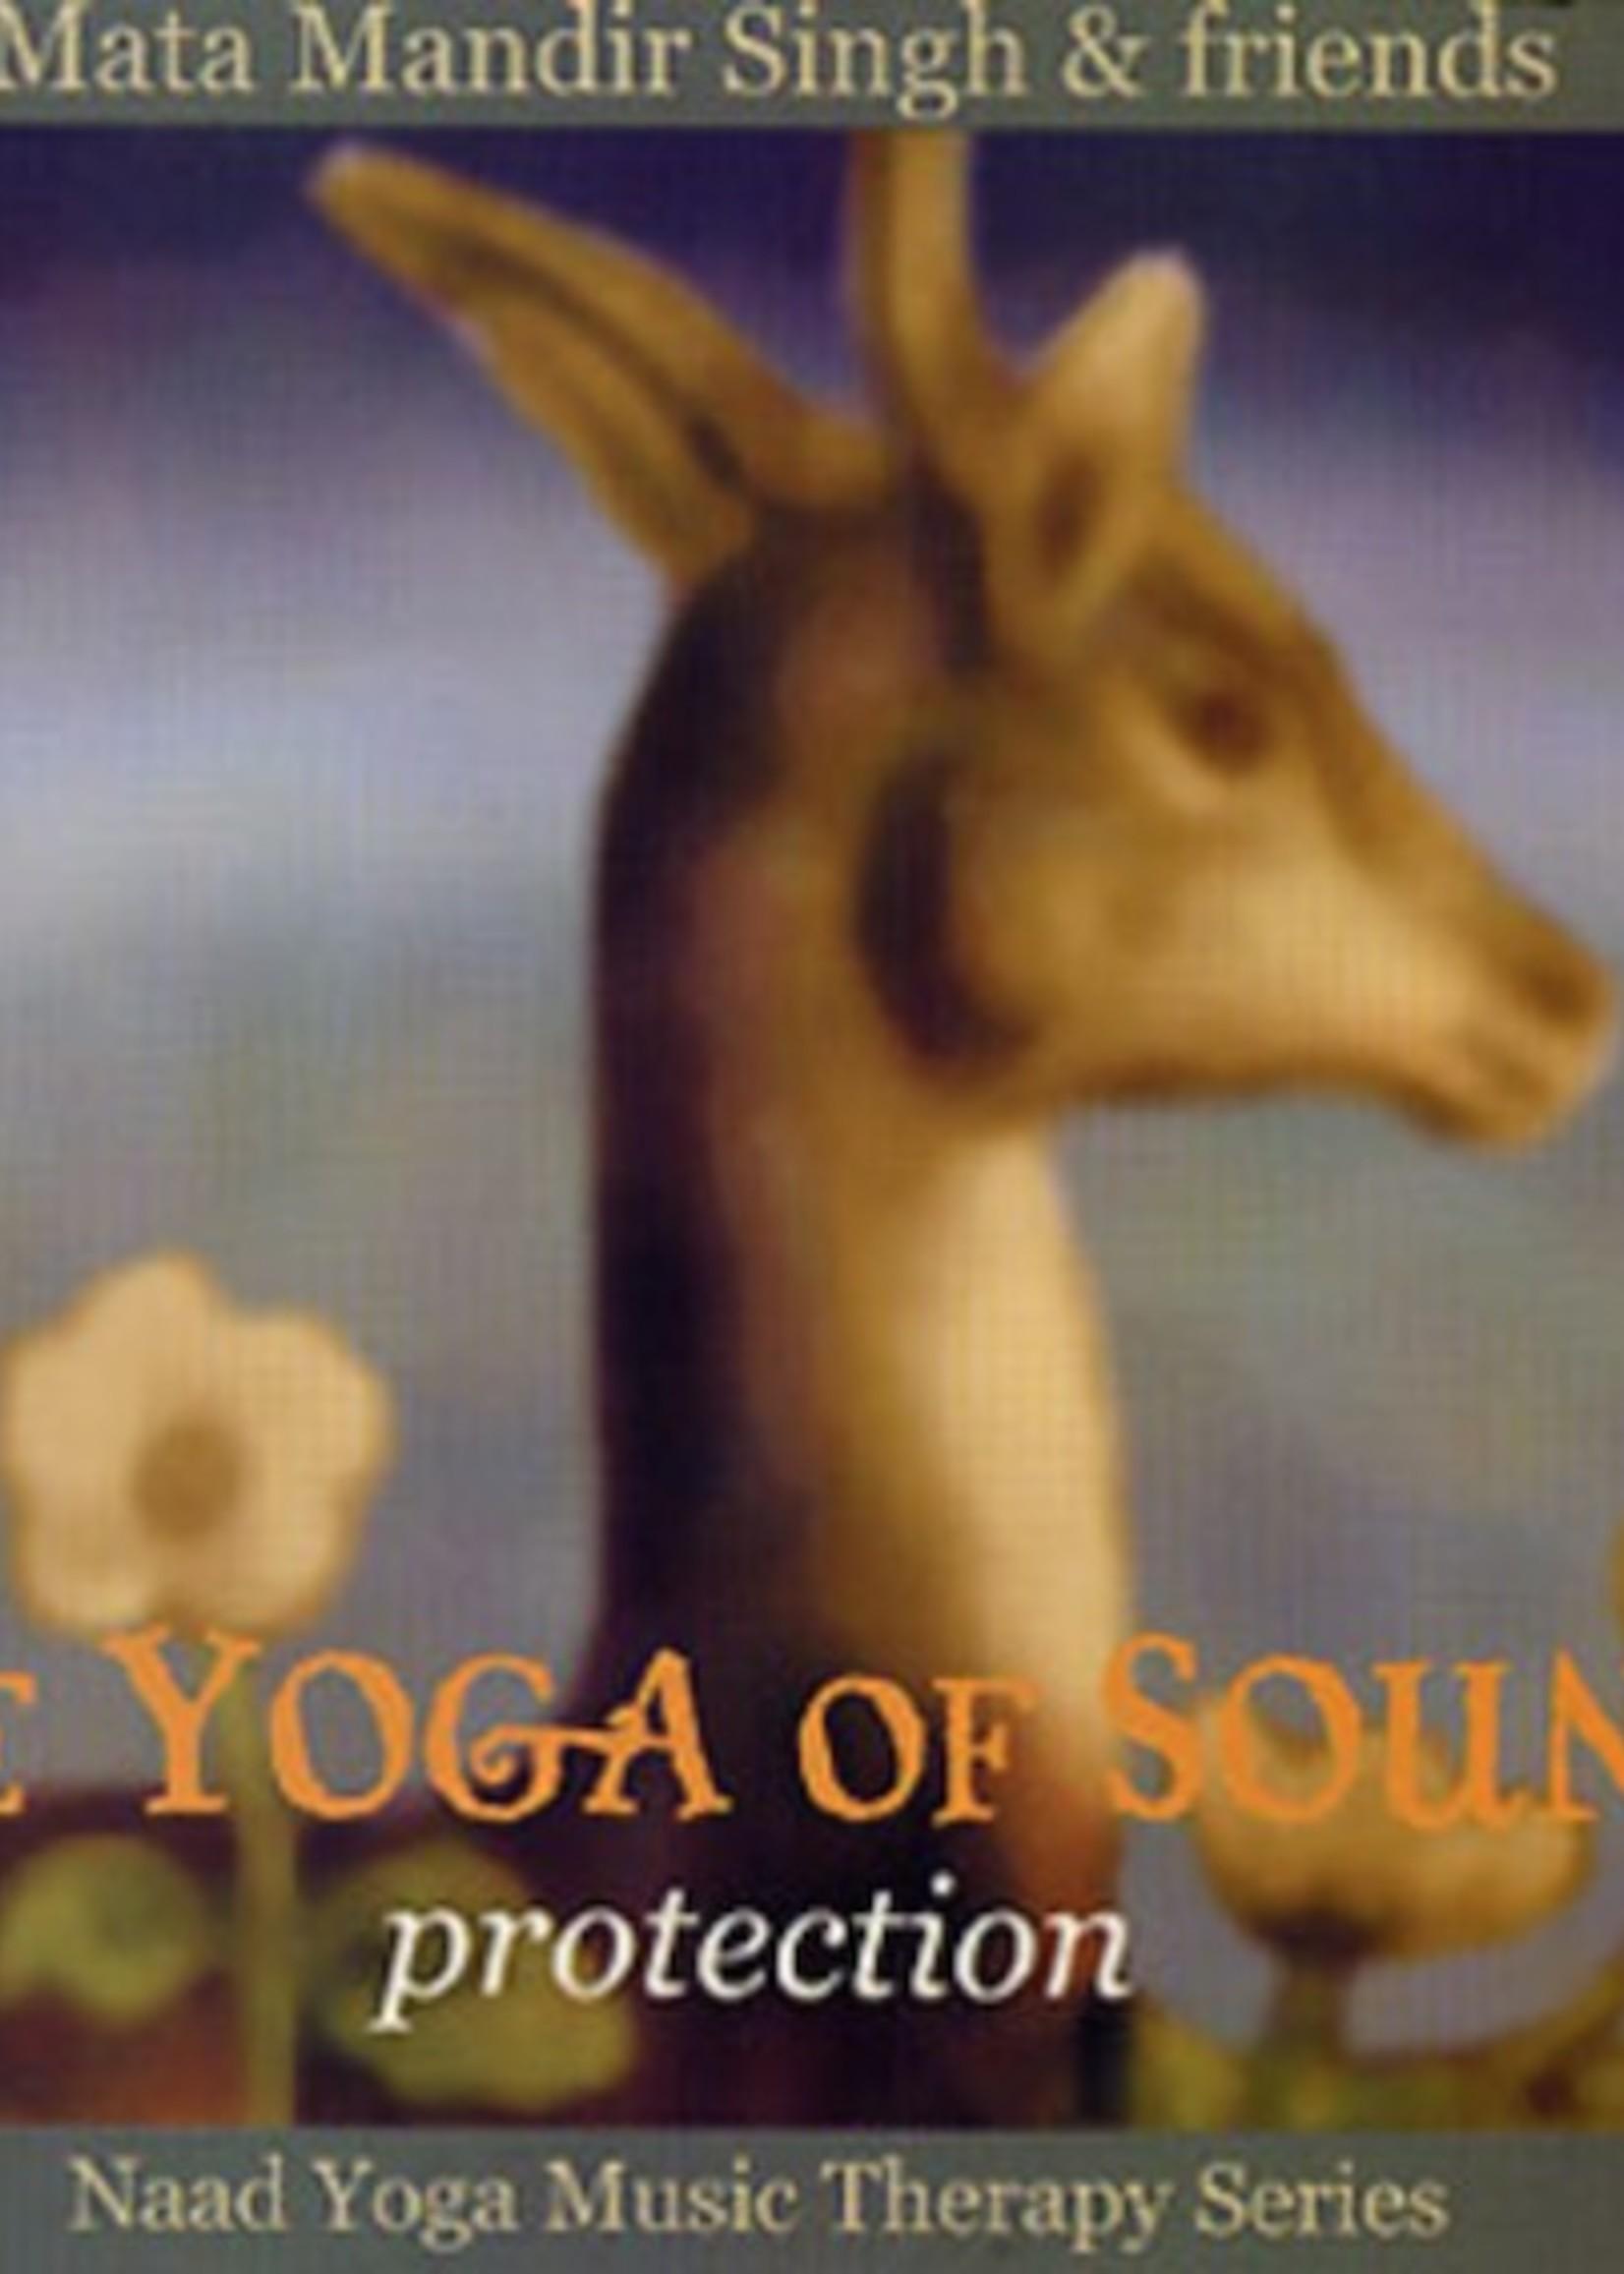 Mata Mandir Singh & Friends The Yoga of Sound | Protection